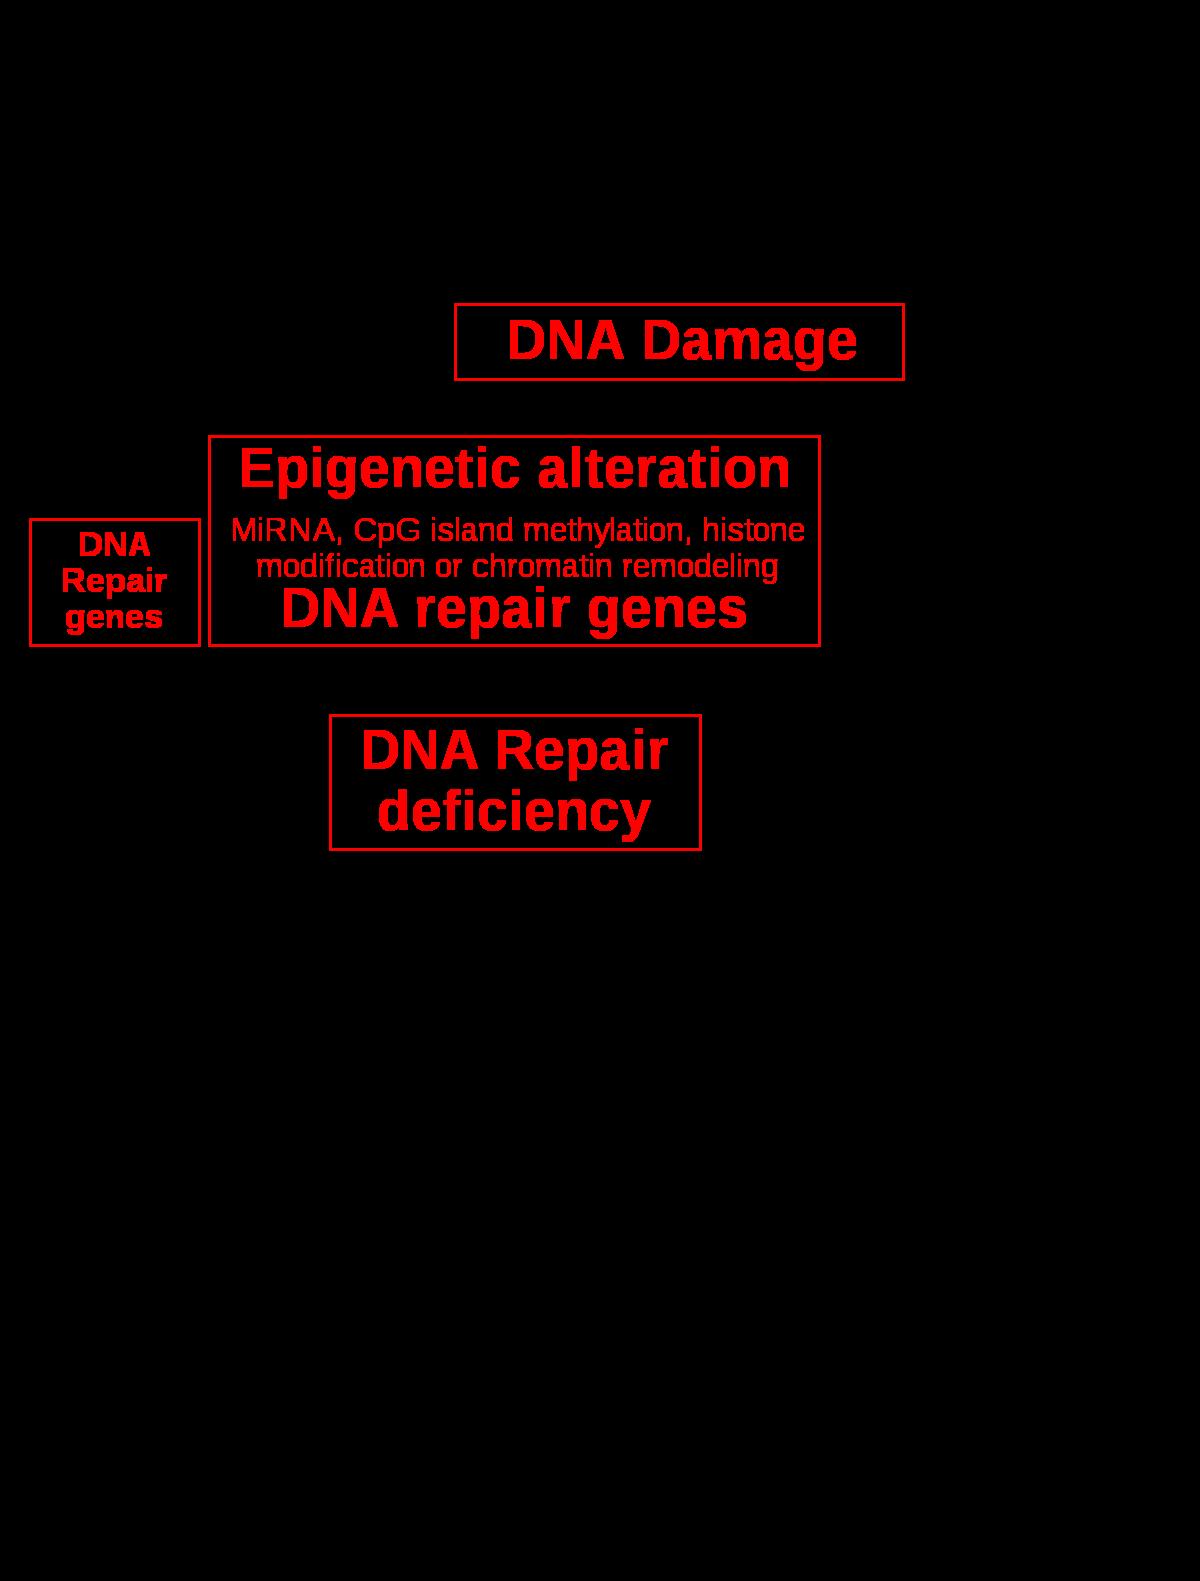 Enterobiosis Rospotrebnadzor - rays.hu